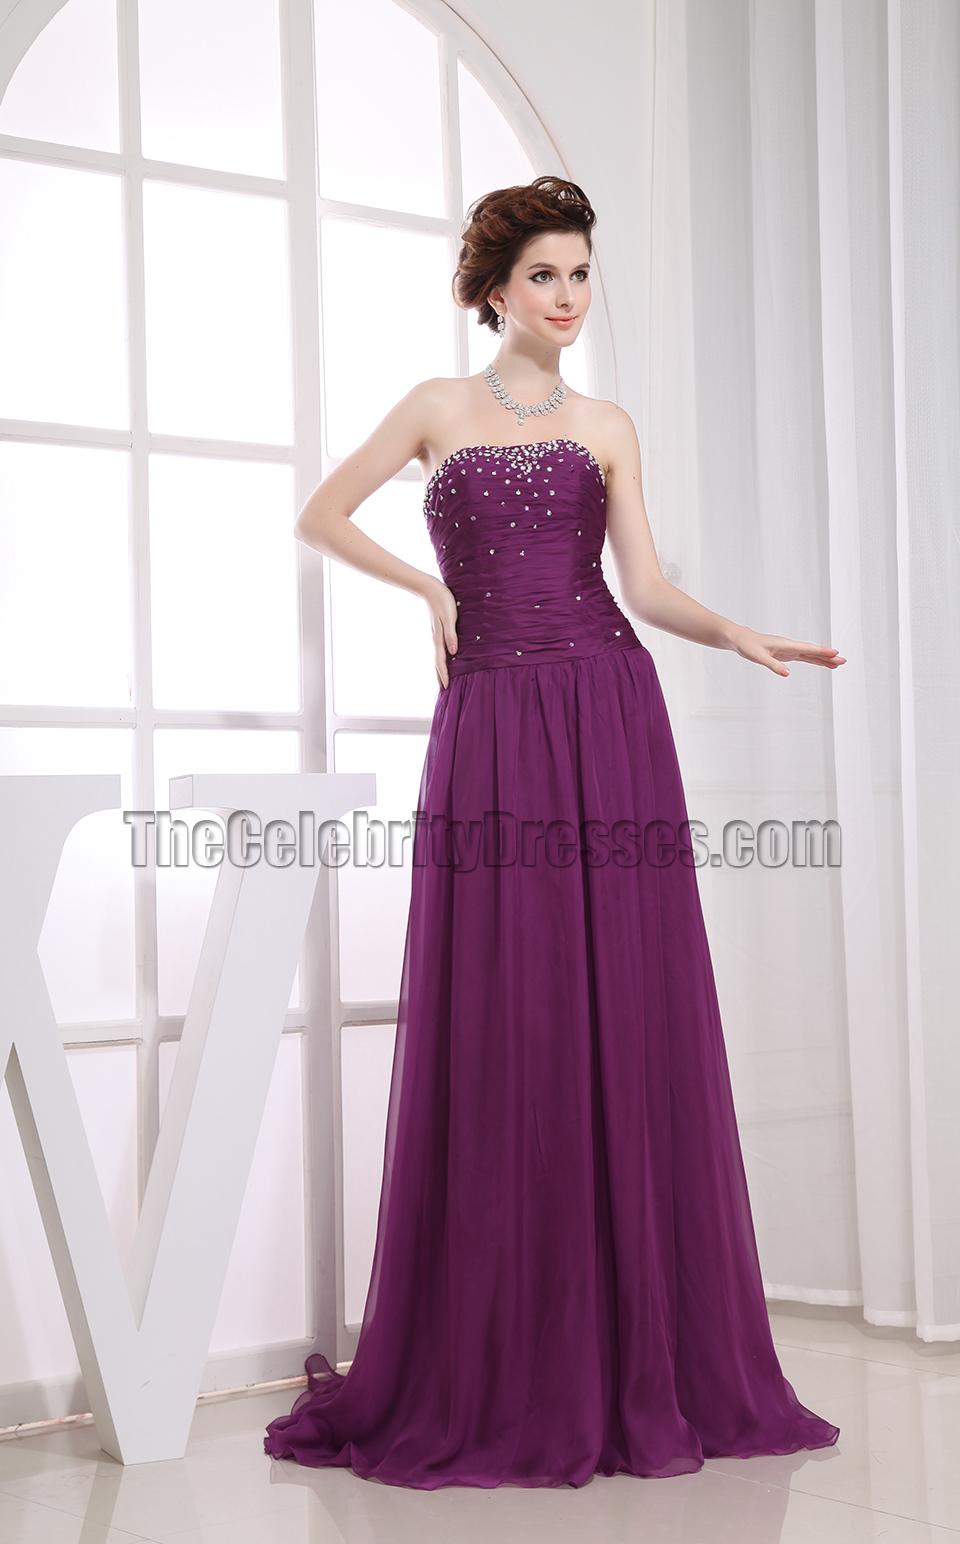 Purple Bridesmaid Dresses - TheCelebrityDresses